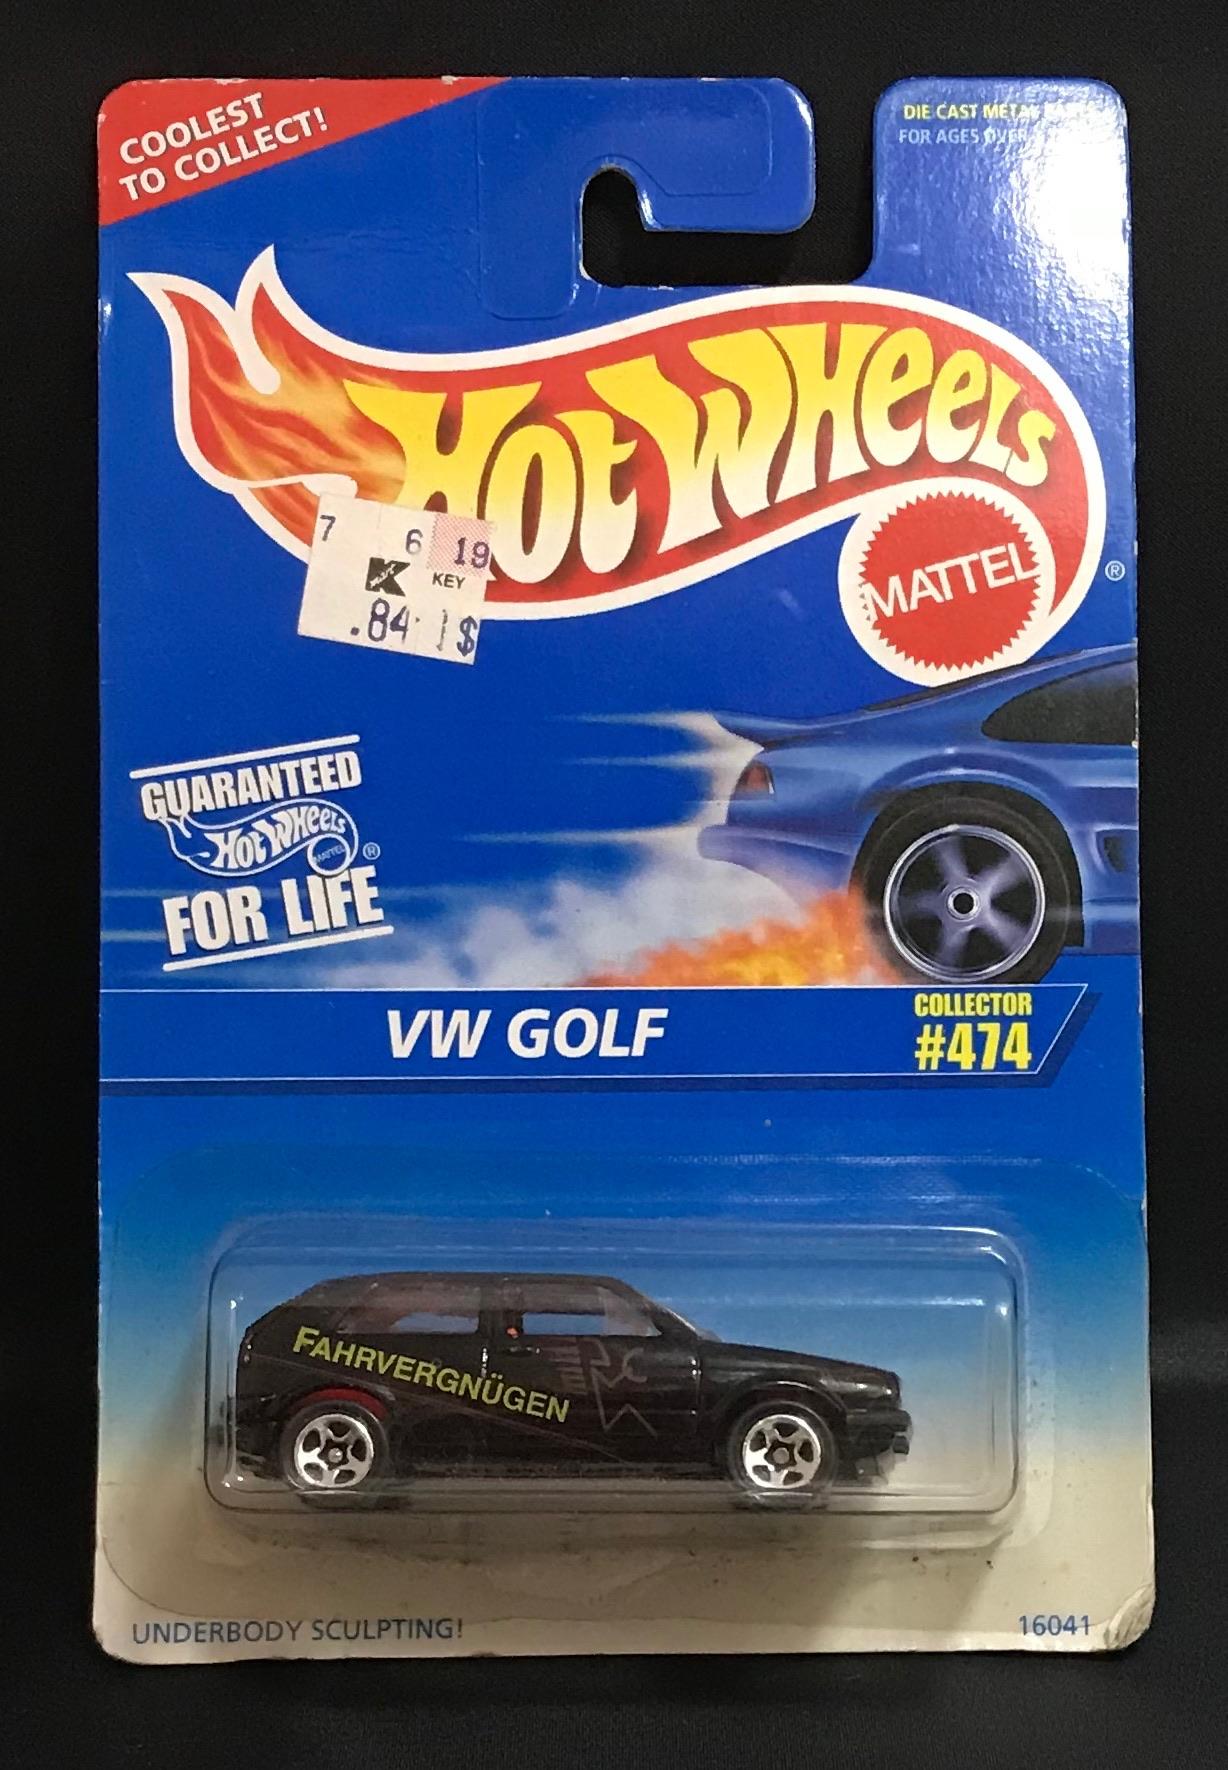 Hot Wheels Vw Volkswagen Golf Mk2 In Black Fahrvergnugen New Old Stock Junk Yard Retros We have collected for you emblem stickers for car body, vw grille badges, 3d fender and door stickers, etc. hot wheels vw volkswagen golf mk2 in black fahrvergnugen new old stock